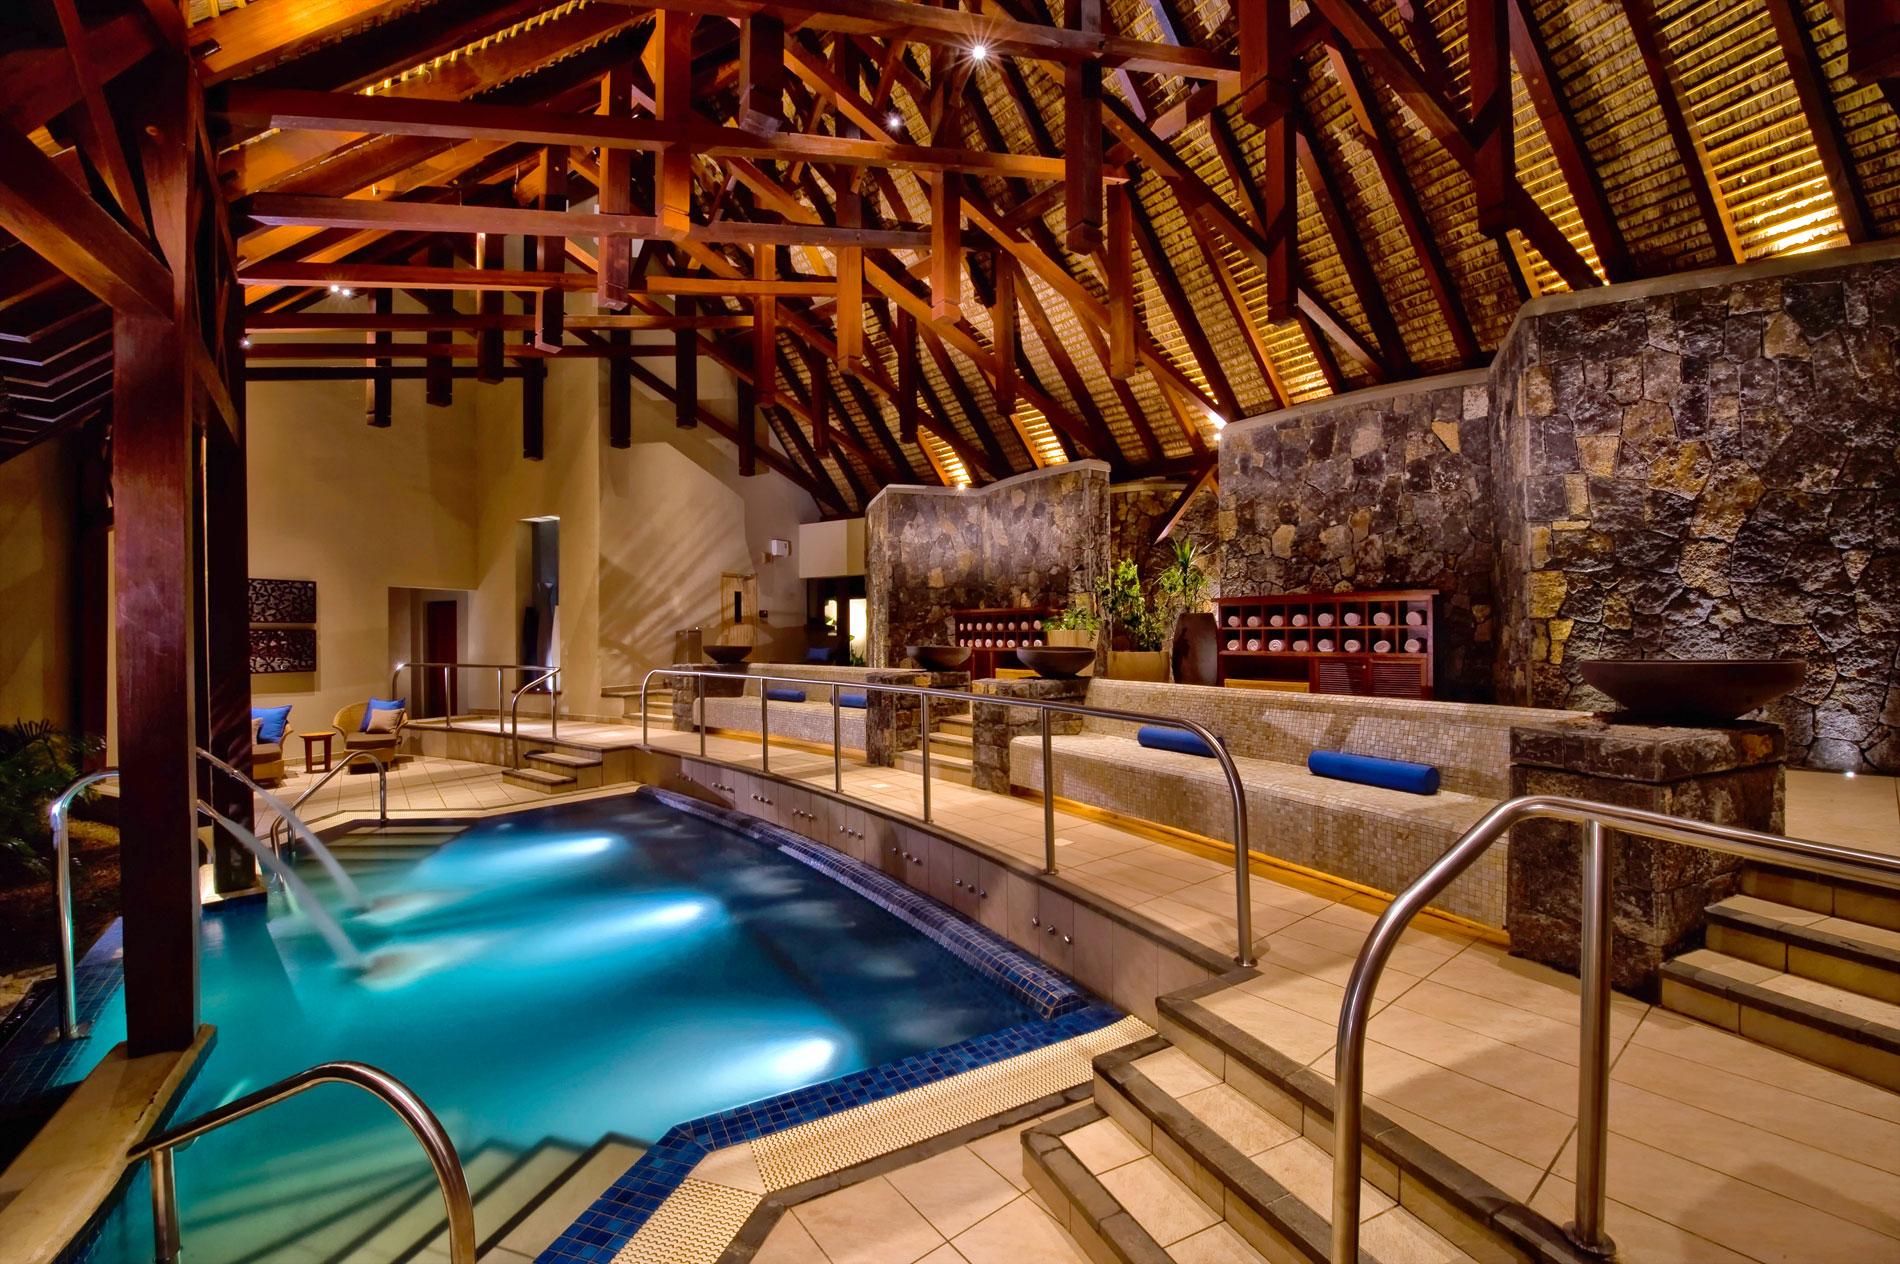 hotelfotografie vision photos hotelphotography